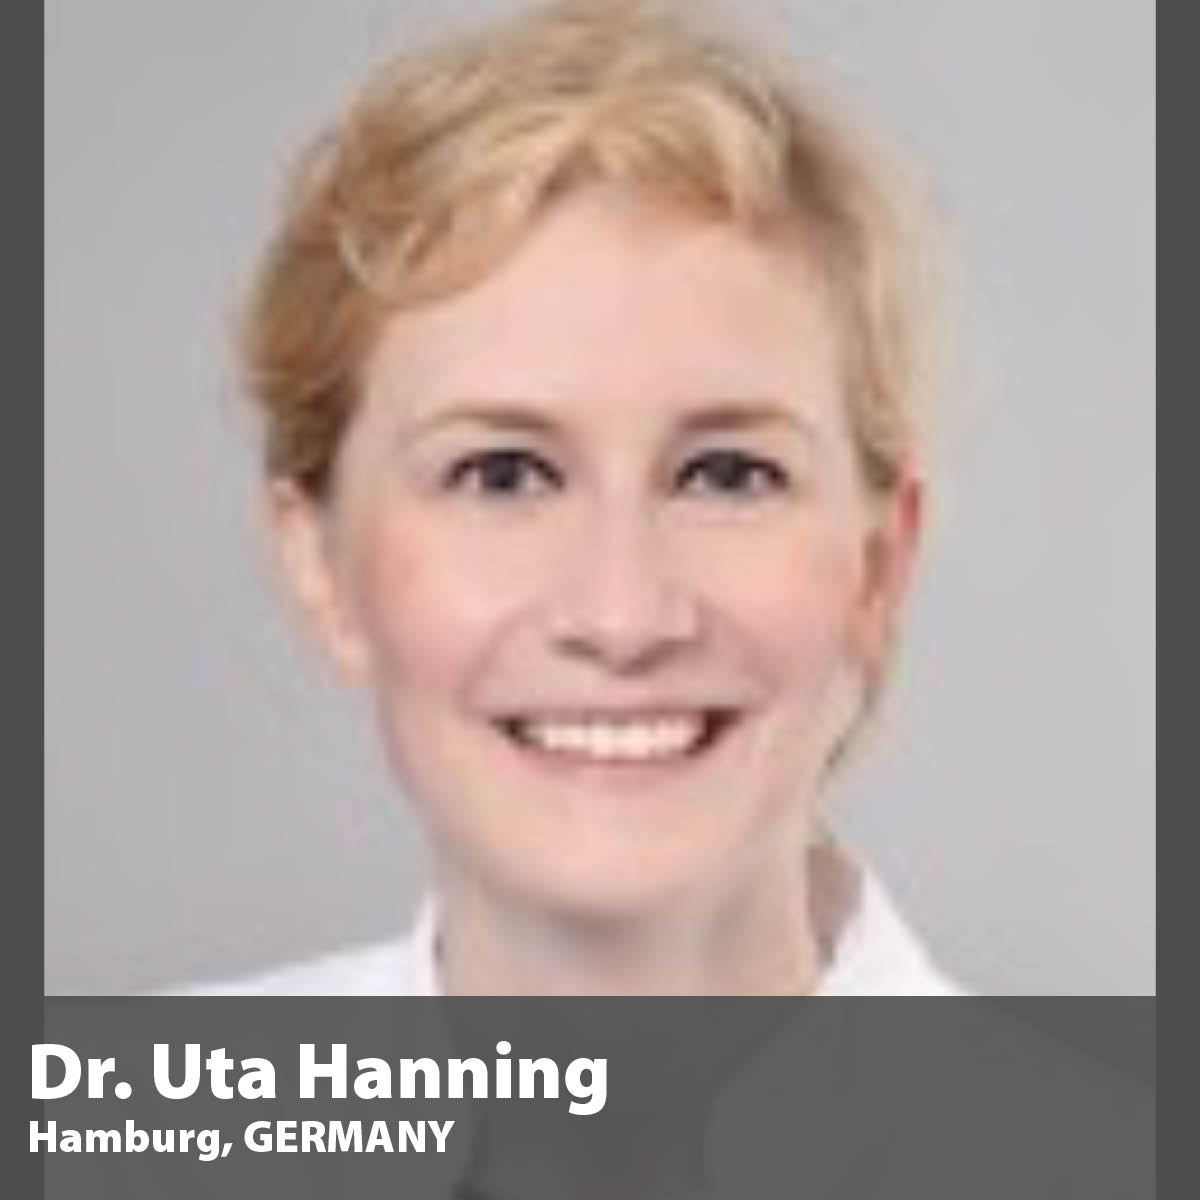 Dr. Uta Hanning